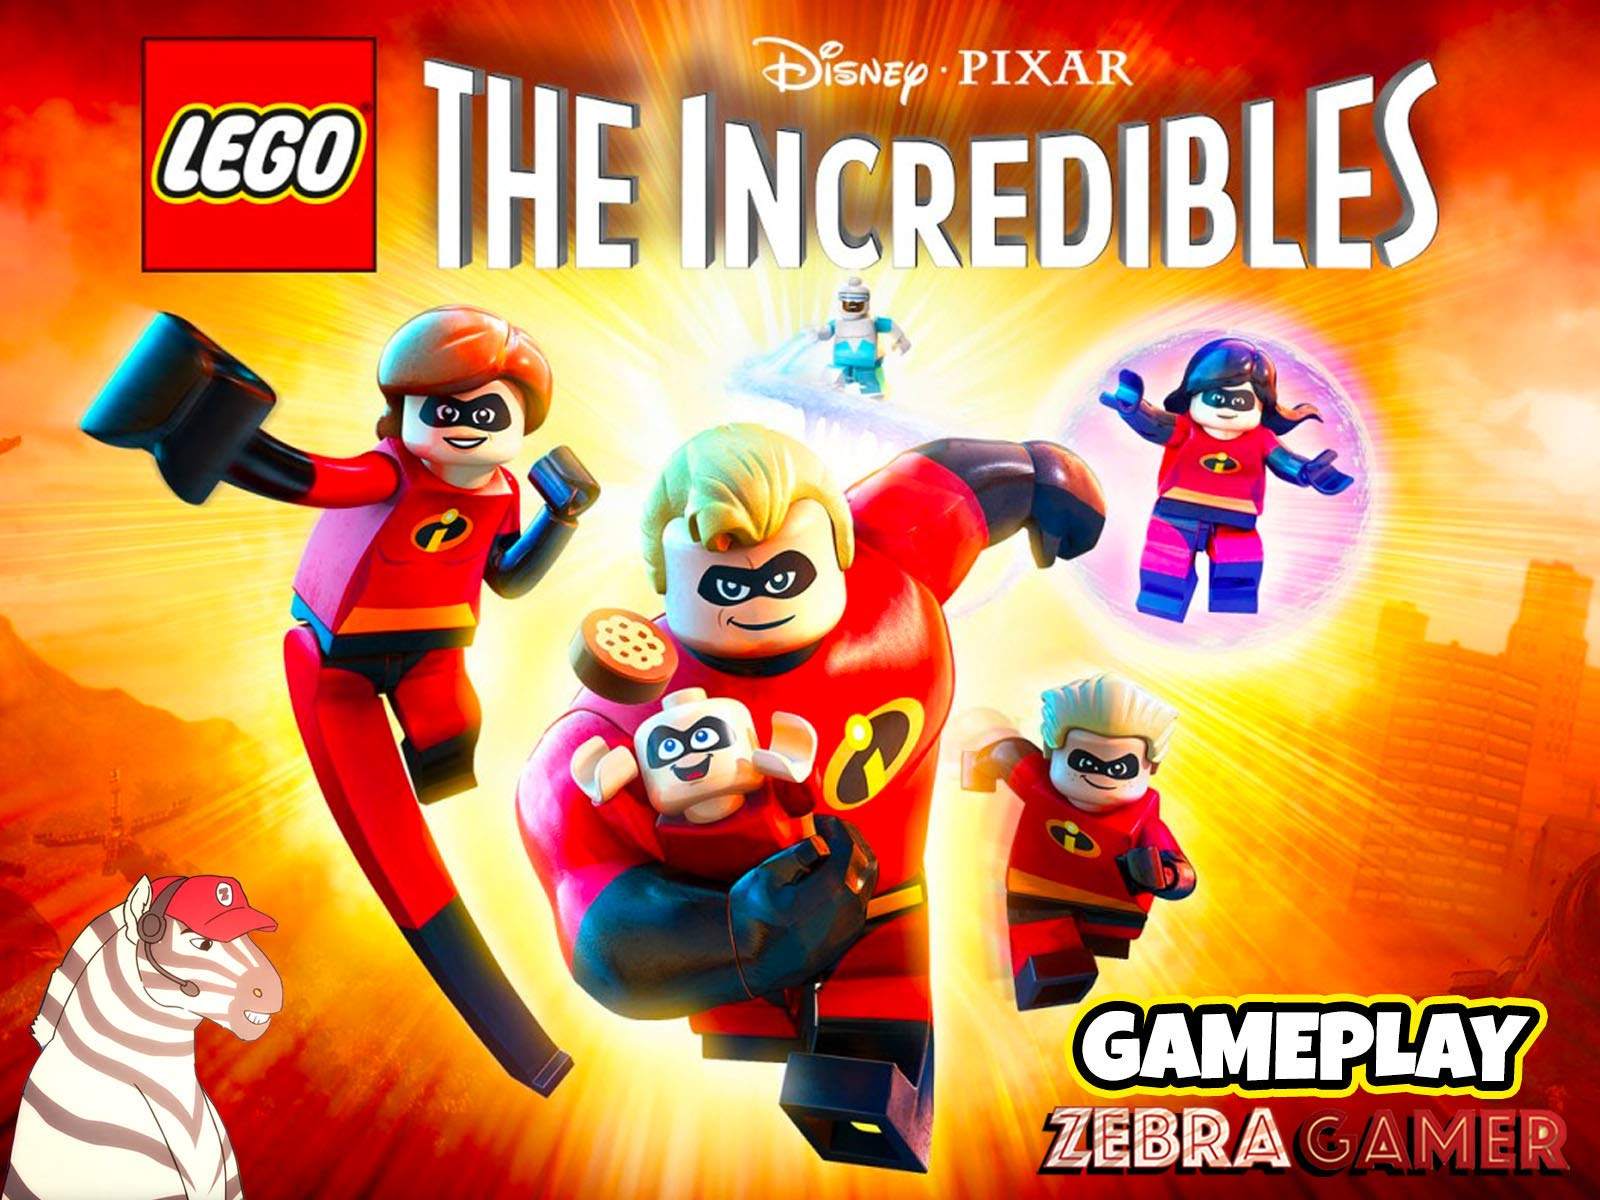 Clip: Lego The Incredibles Gameplay - Zebra Gamer - Season 1